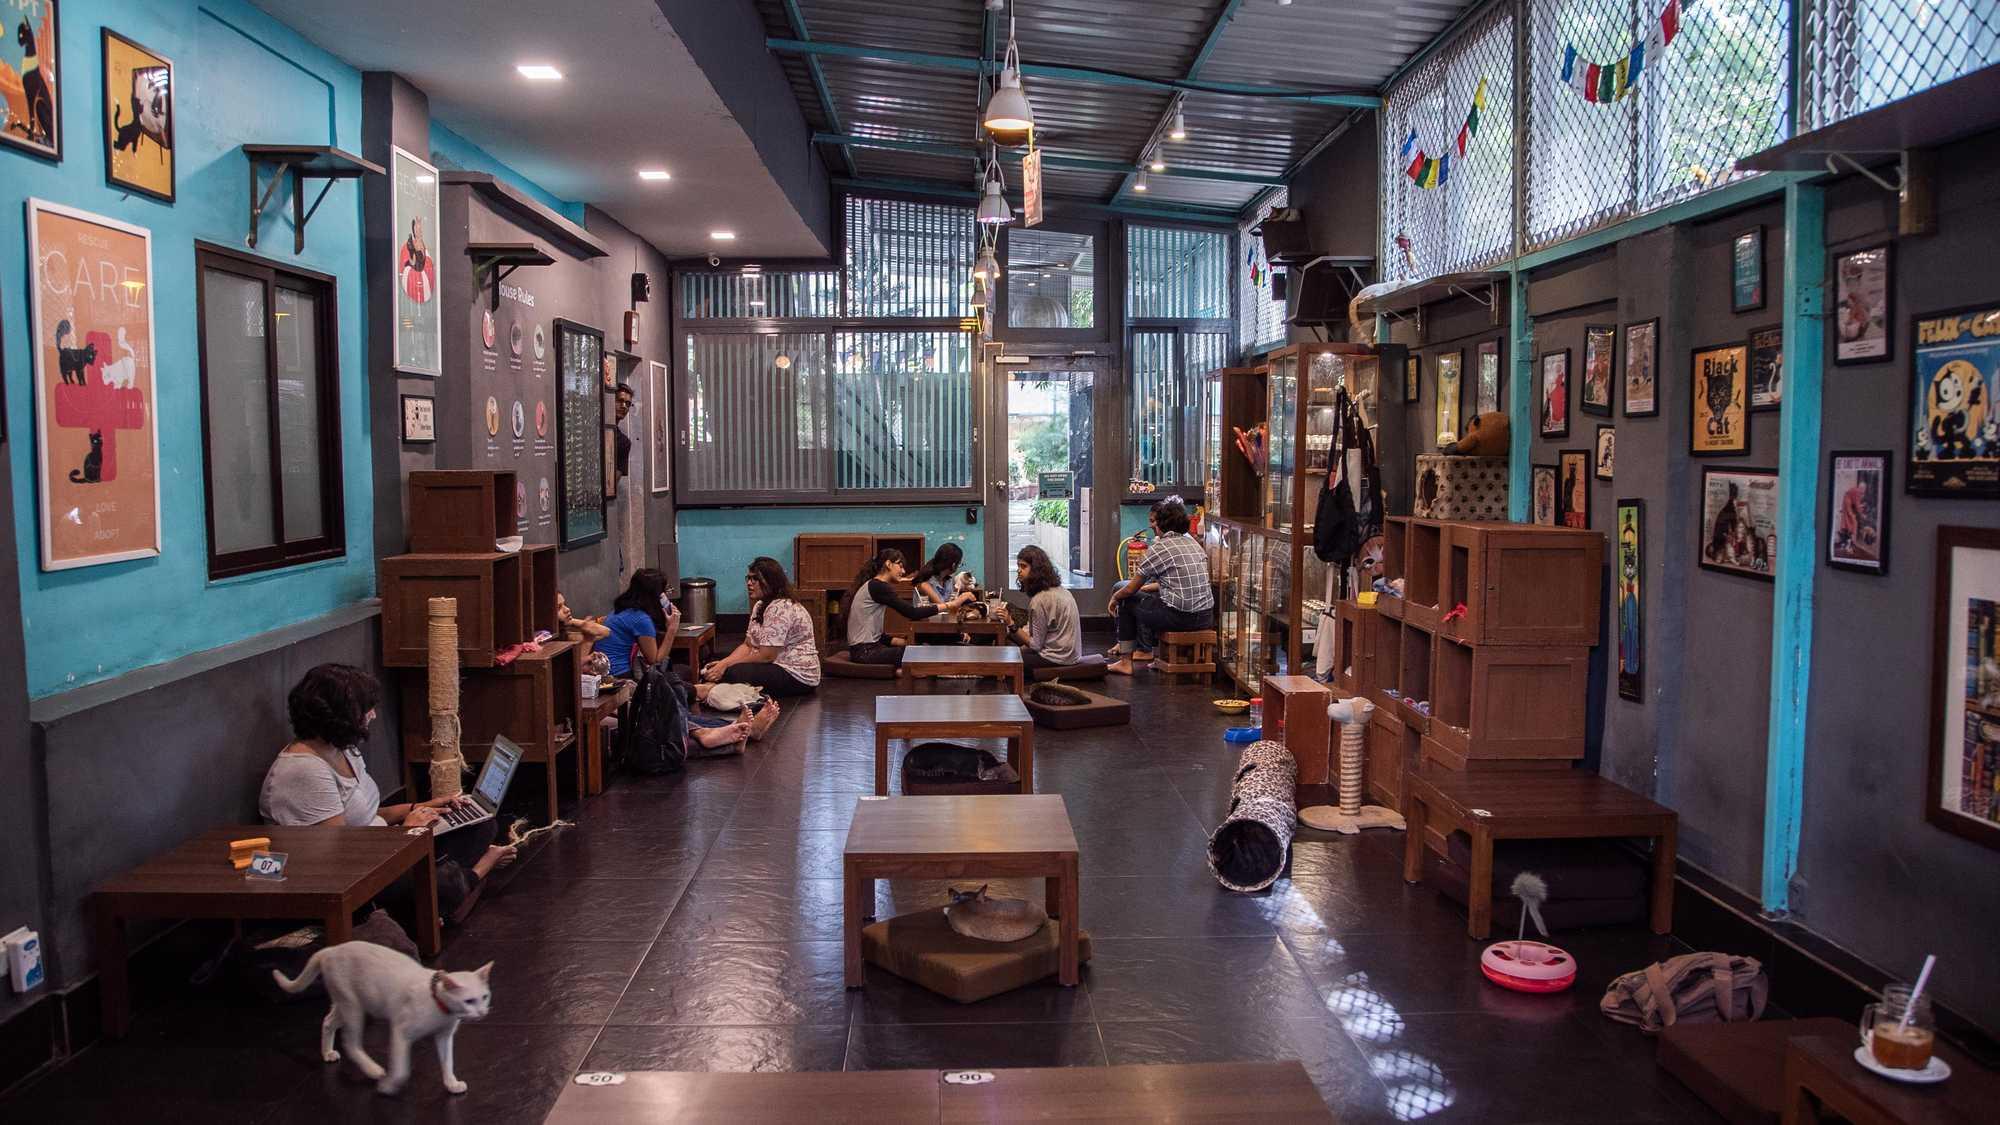 Cat Café Studio, Mumbai- India's first Café for Stray Cats